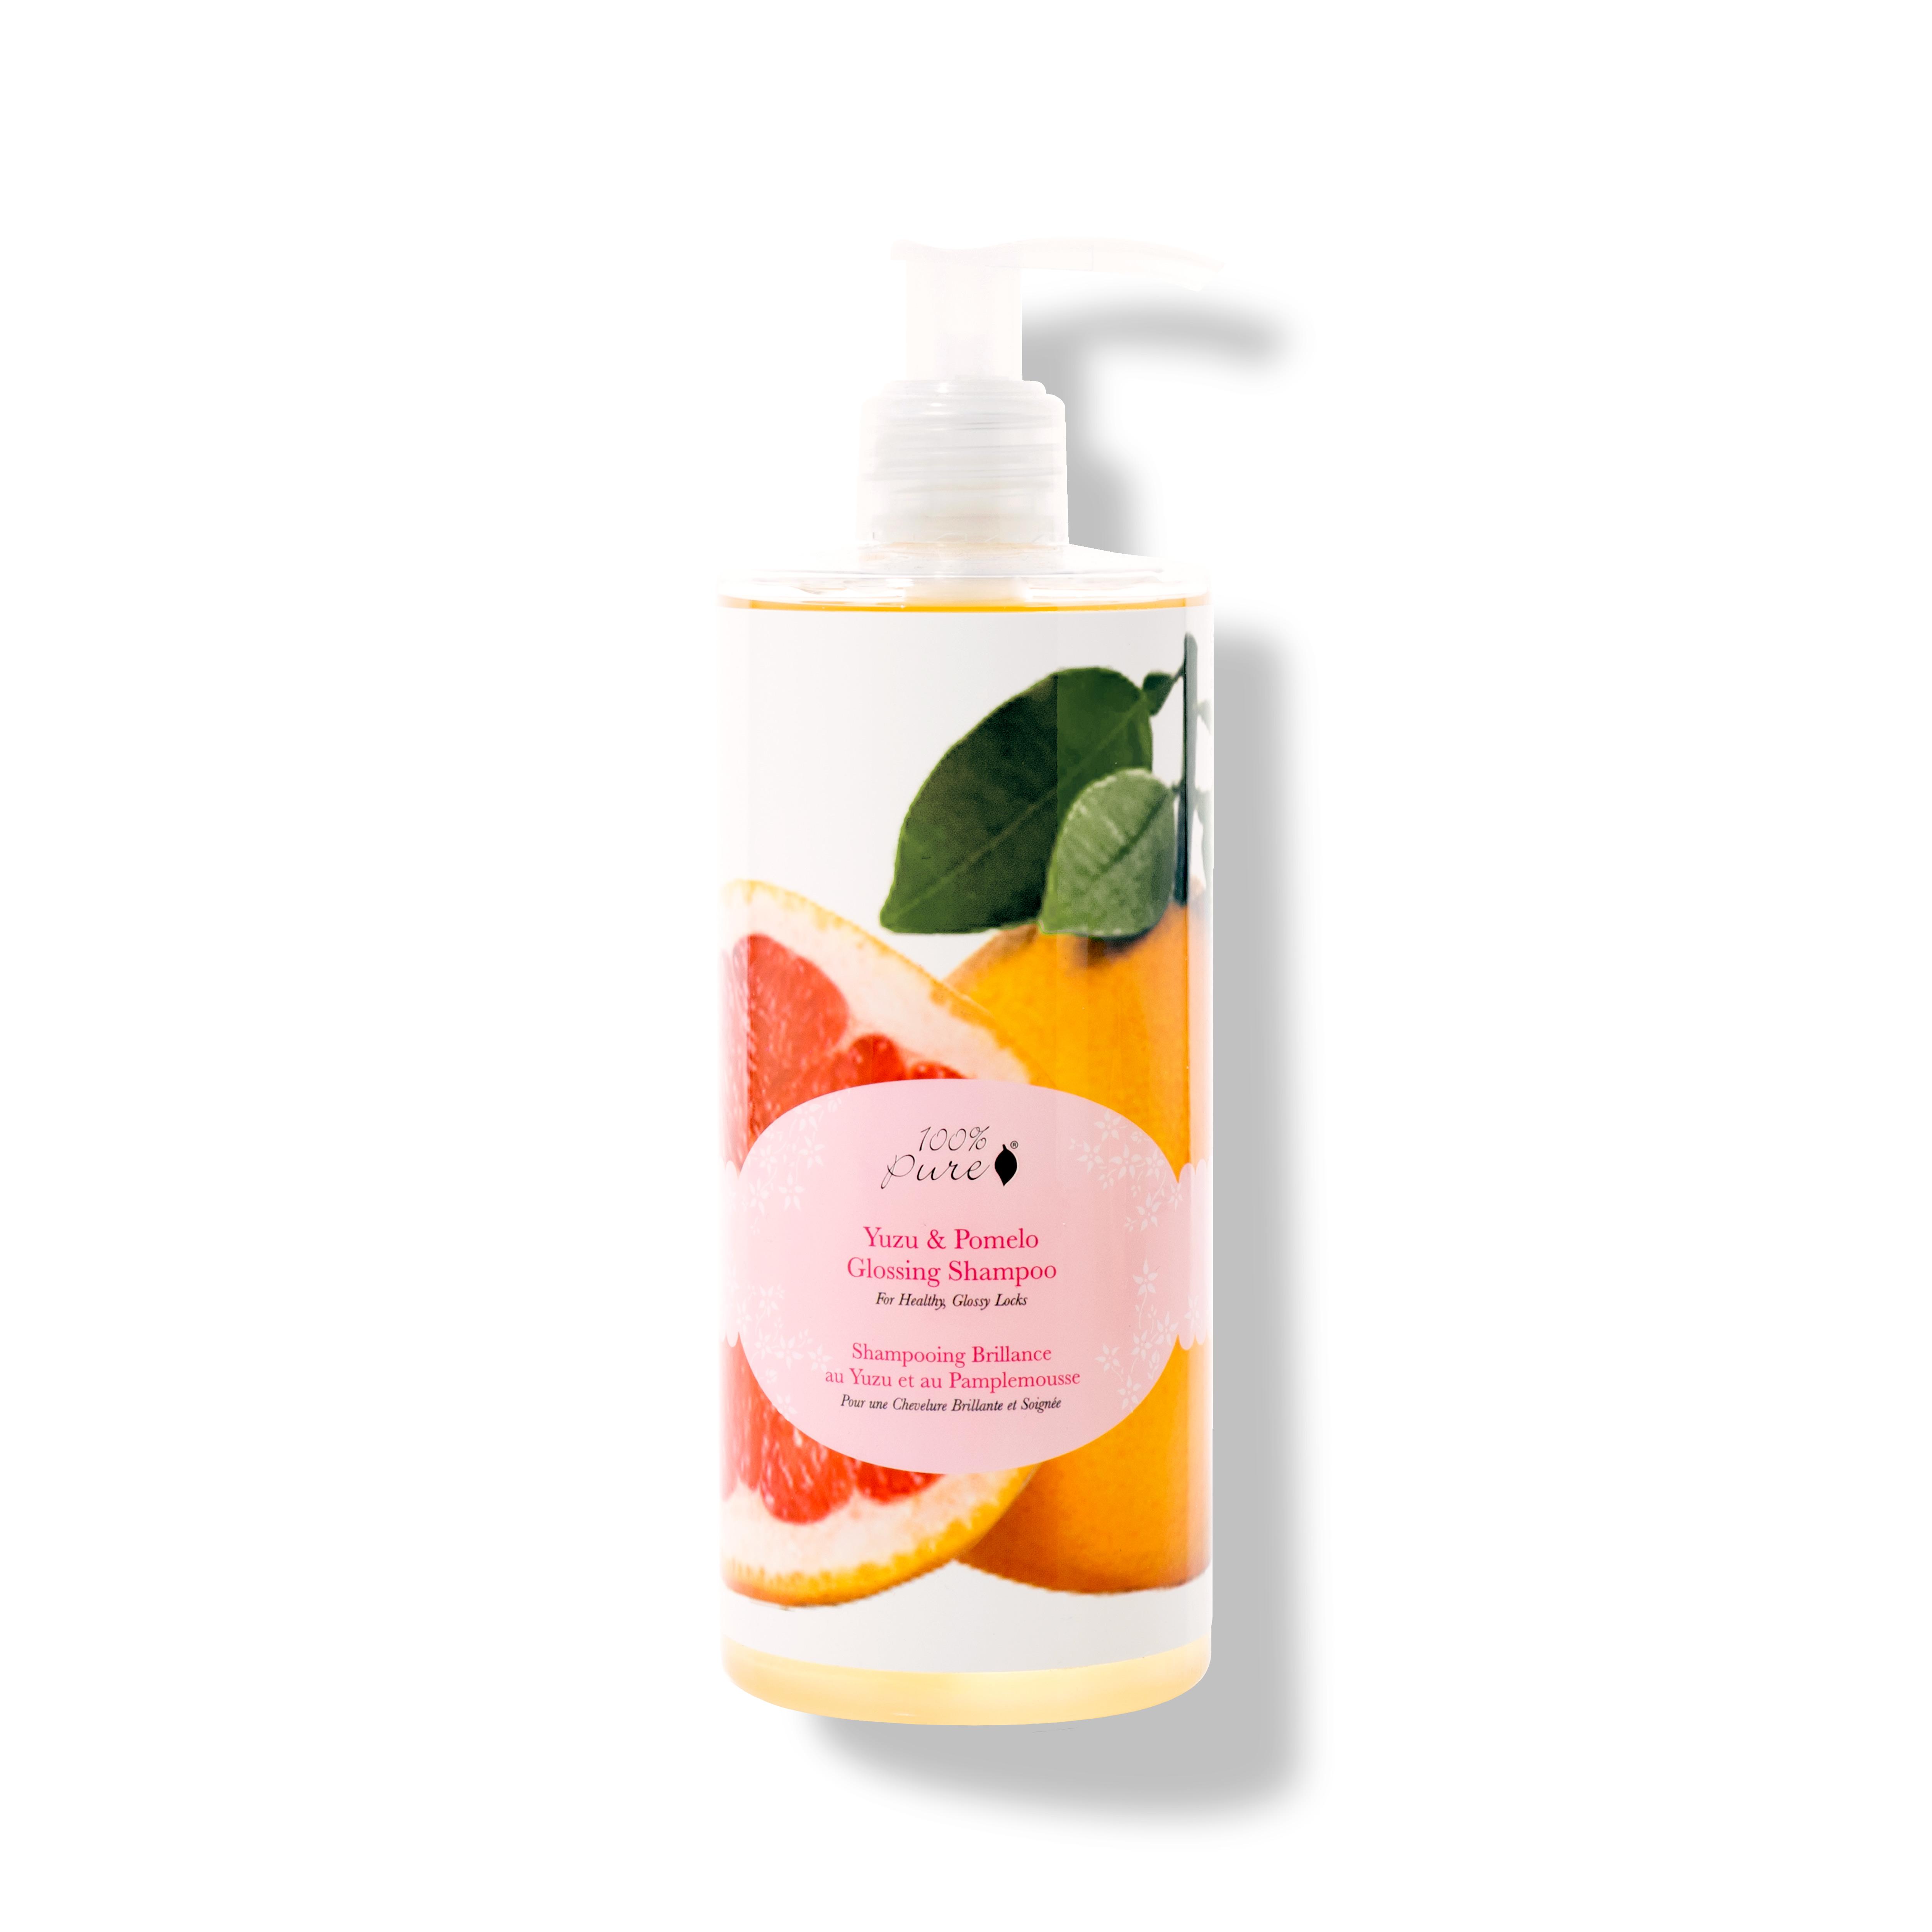 Product Grid - Yuzu & Pomelo Glossing Shampoo 13 oz